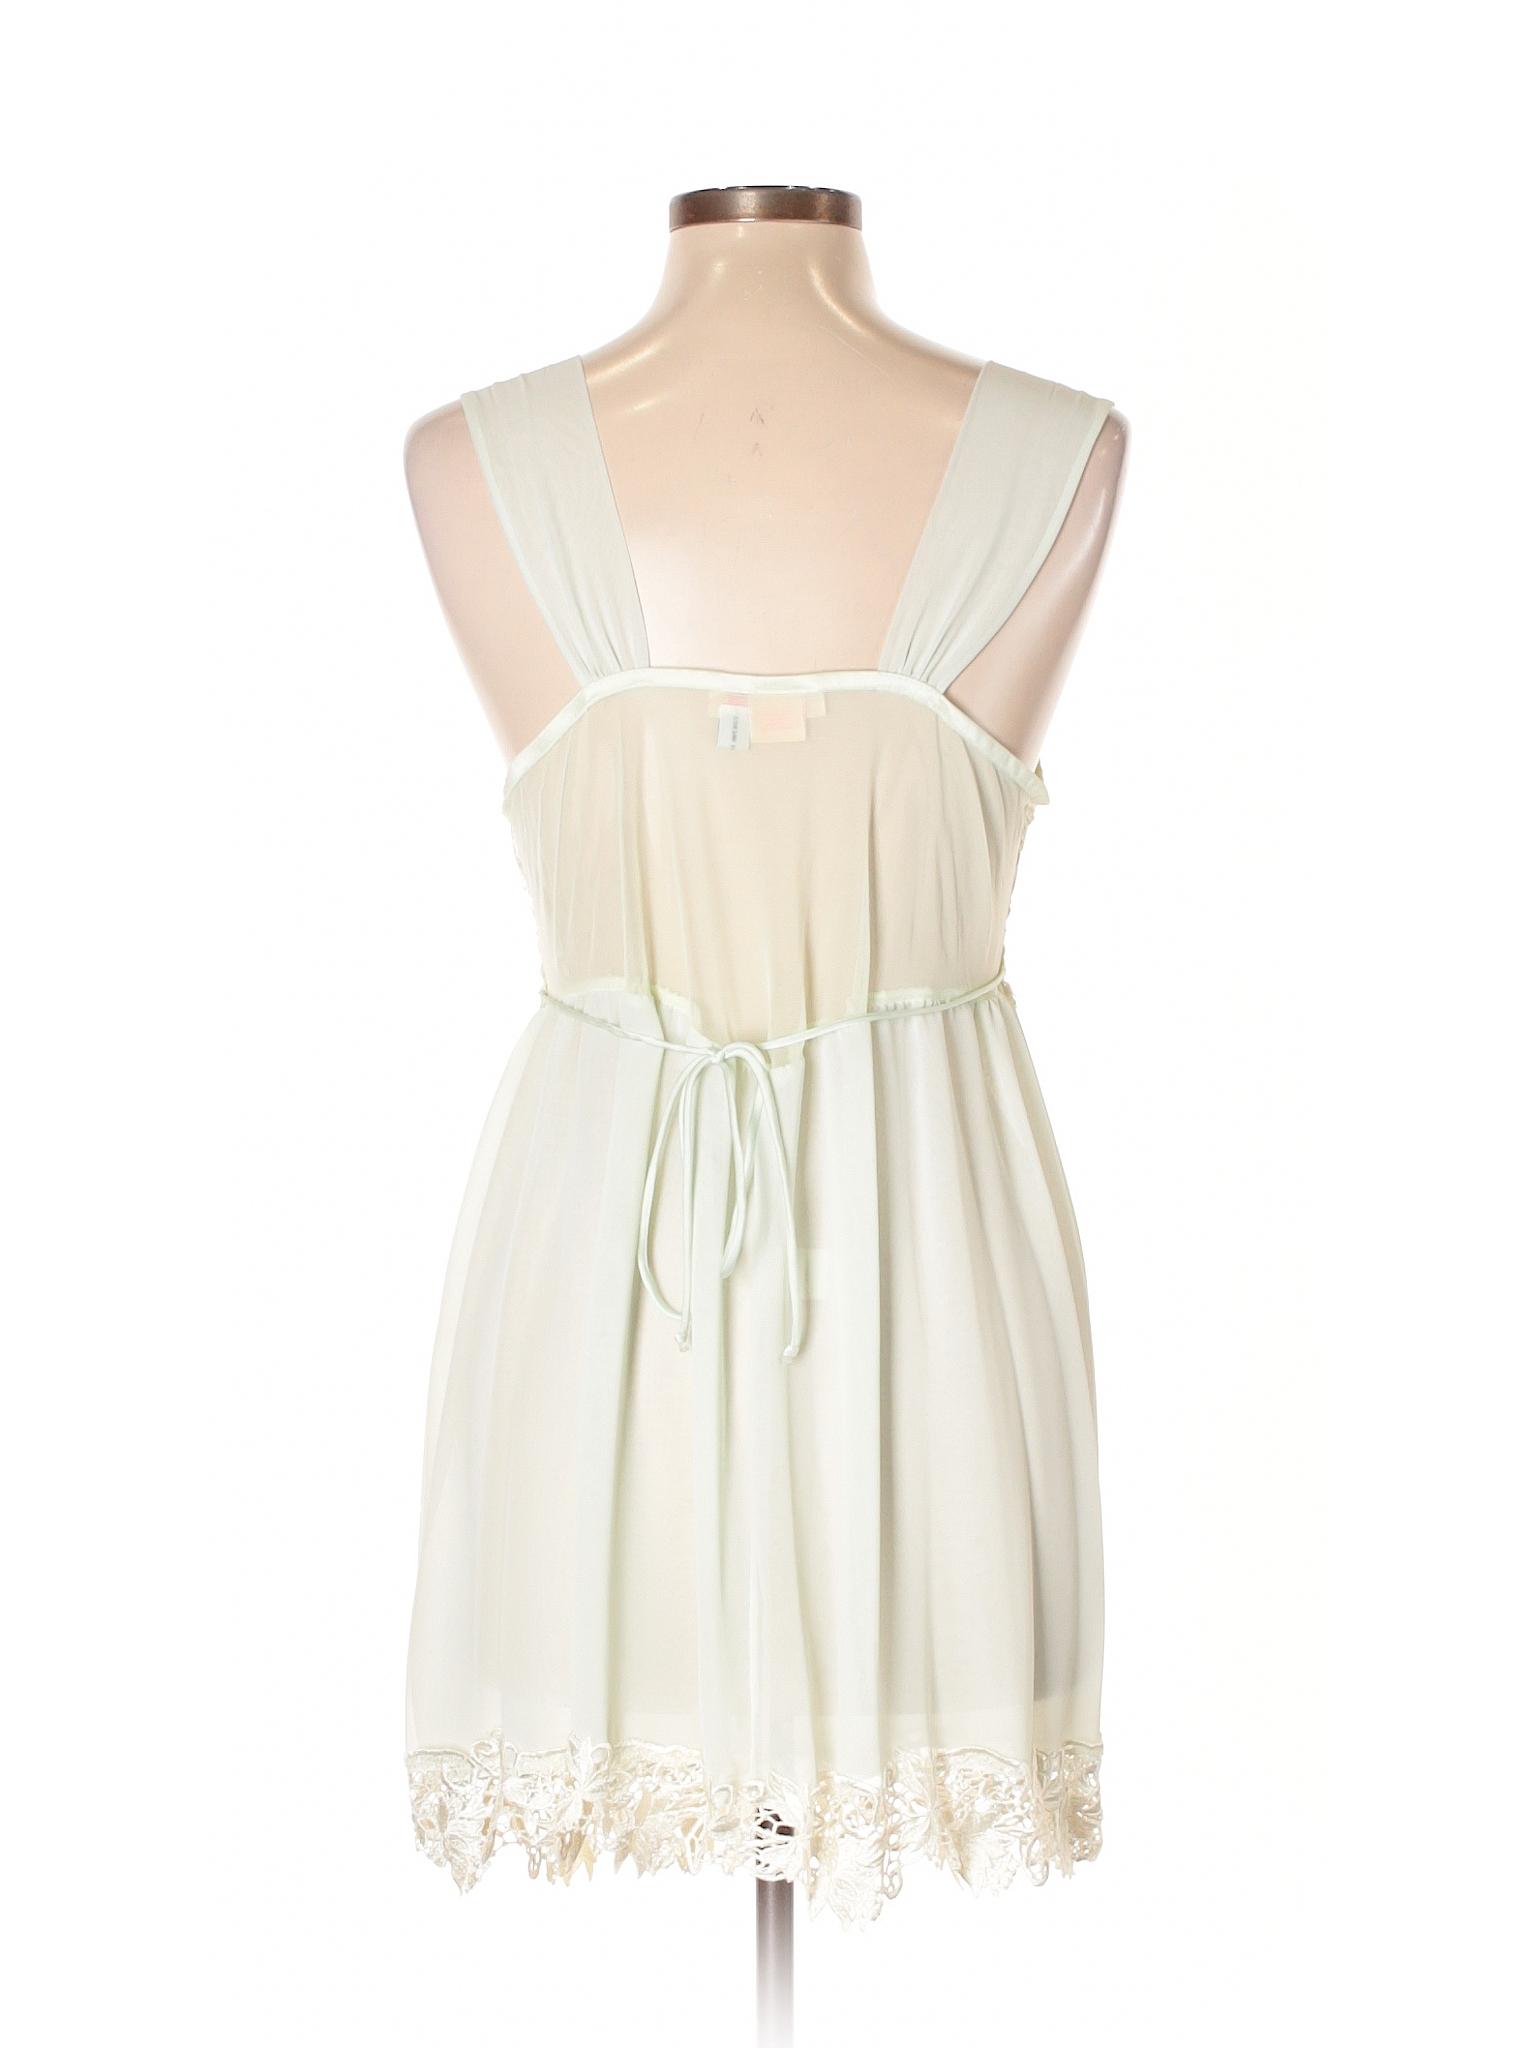 Winter Boutique Casual Dress Saks Avenue Fifth ZUUvdq